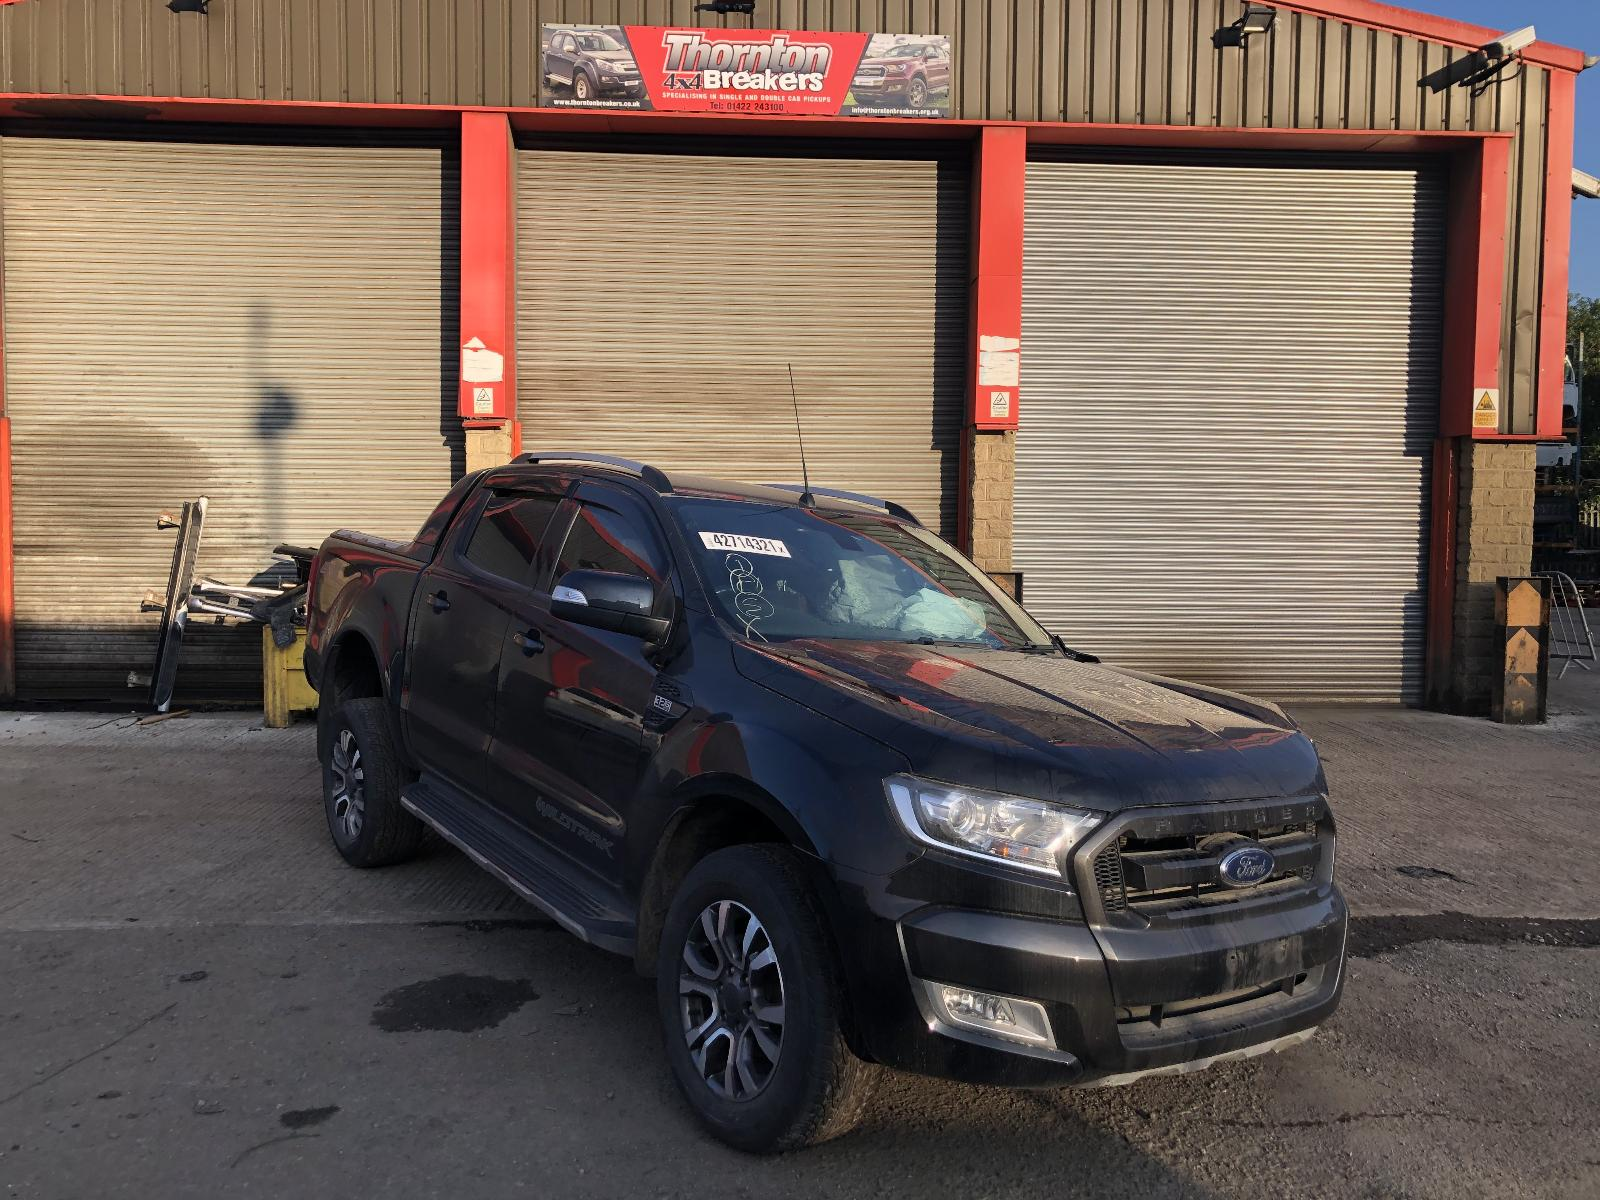 Image for a FORD RANGER 2017 4 Door Pickup